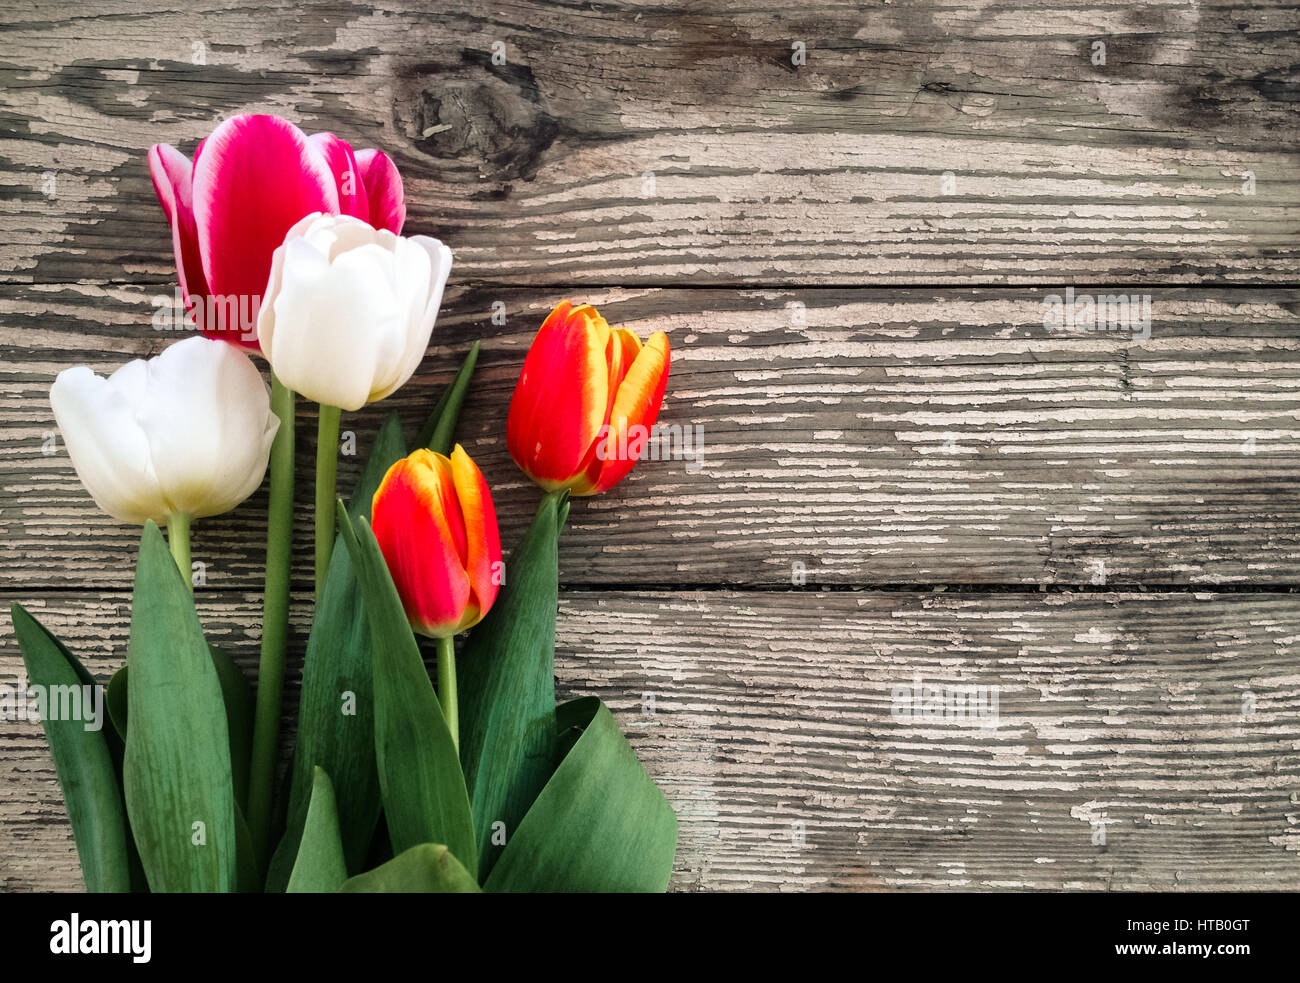 Fall Flowers For Wedding Tulips Flowers Bunch On Dark Barn Wood Planks Background